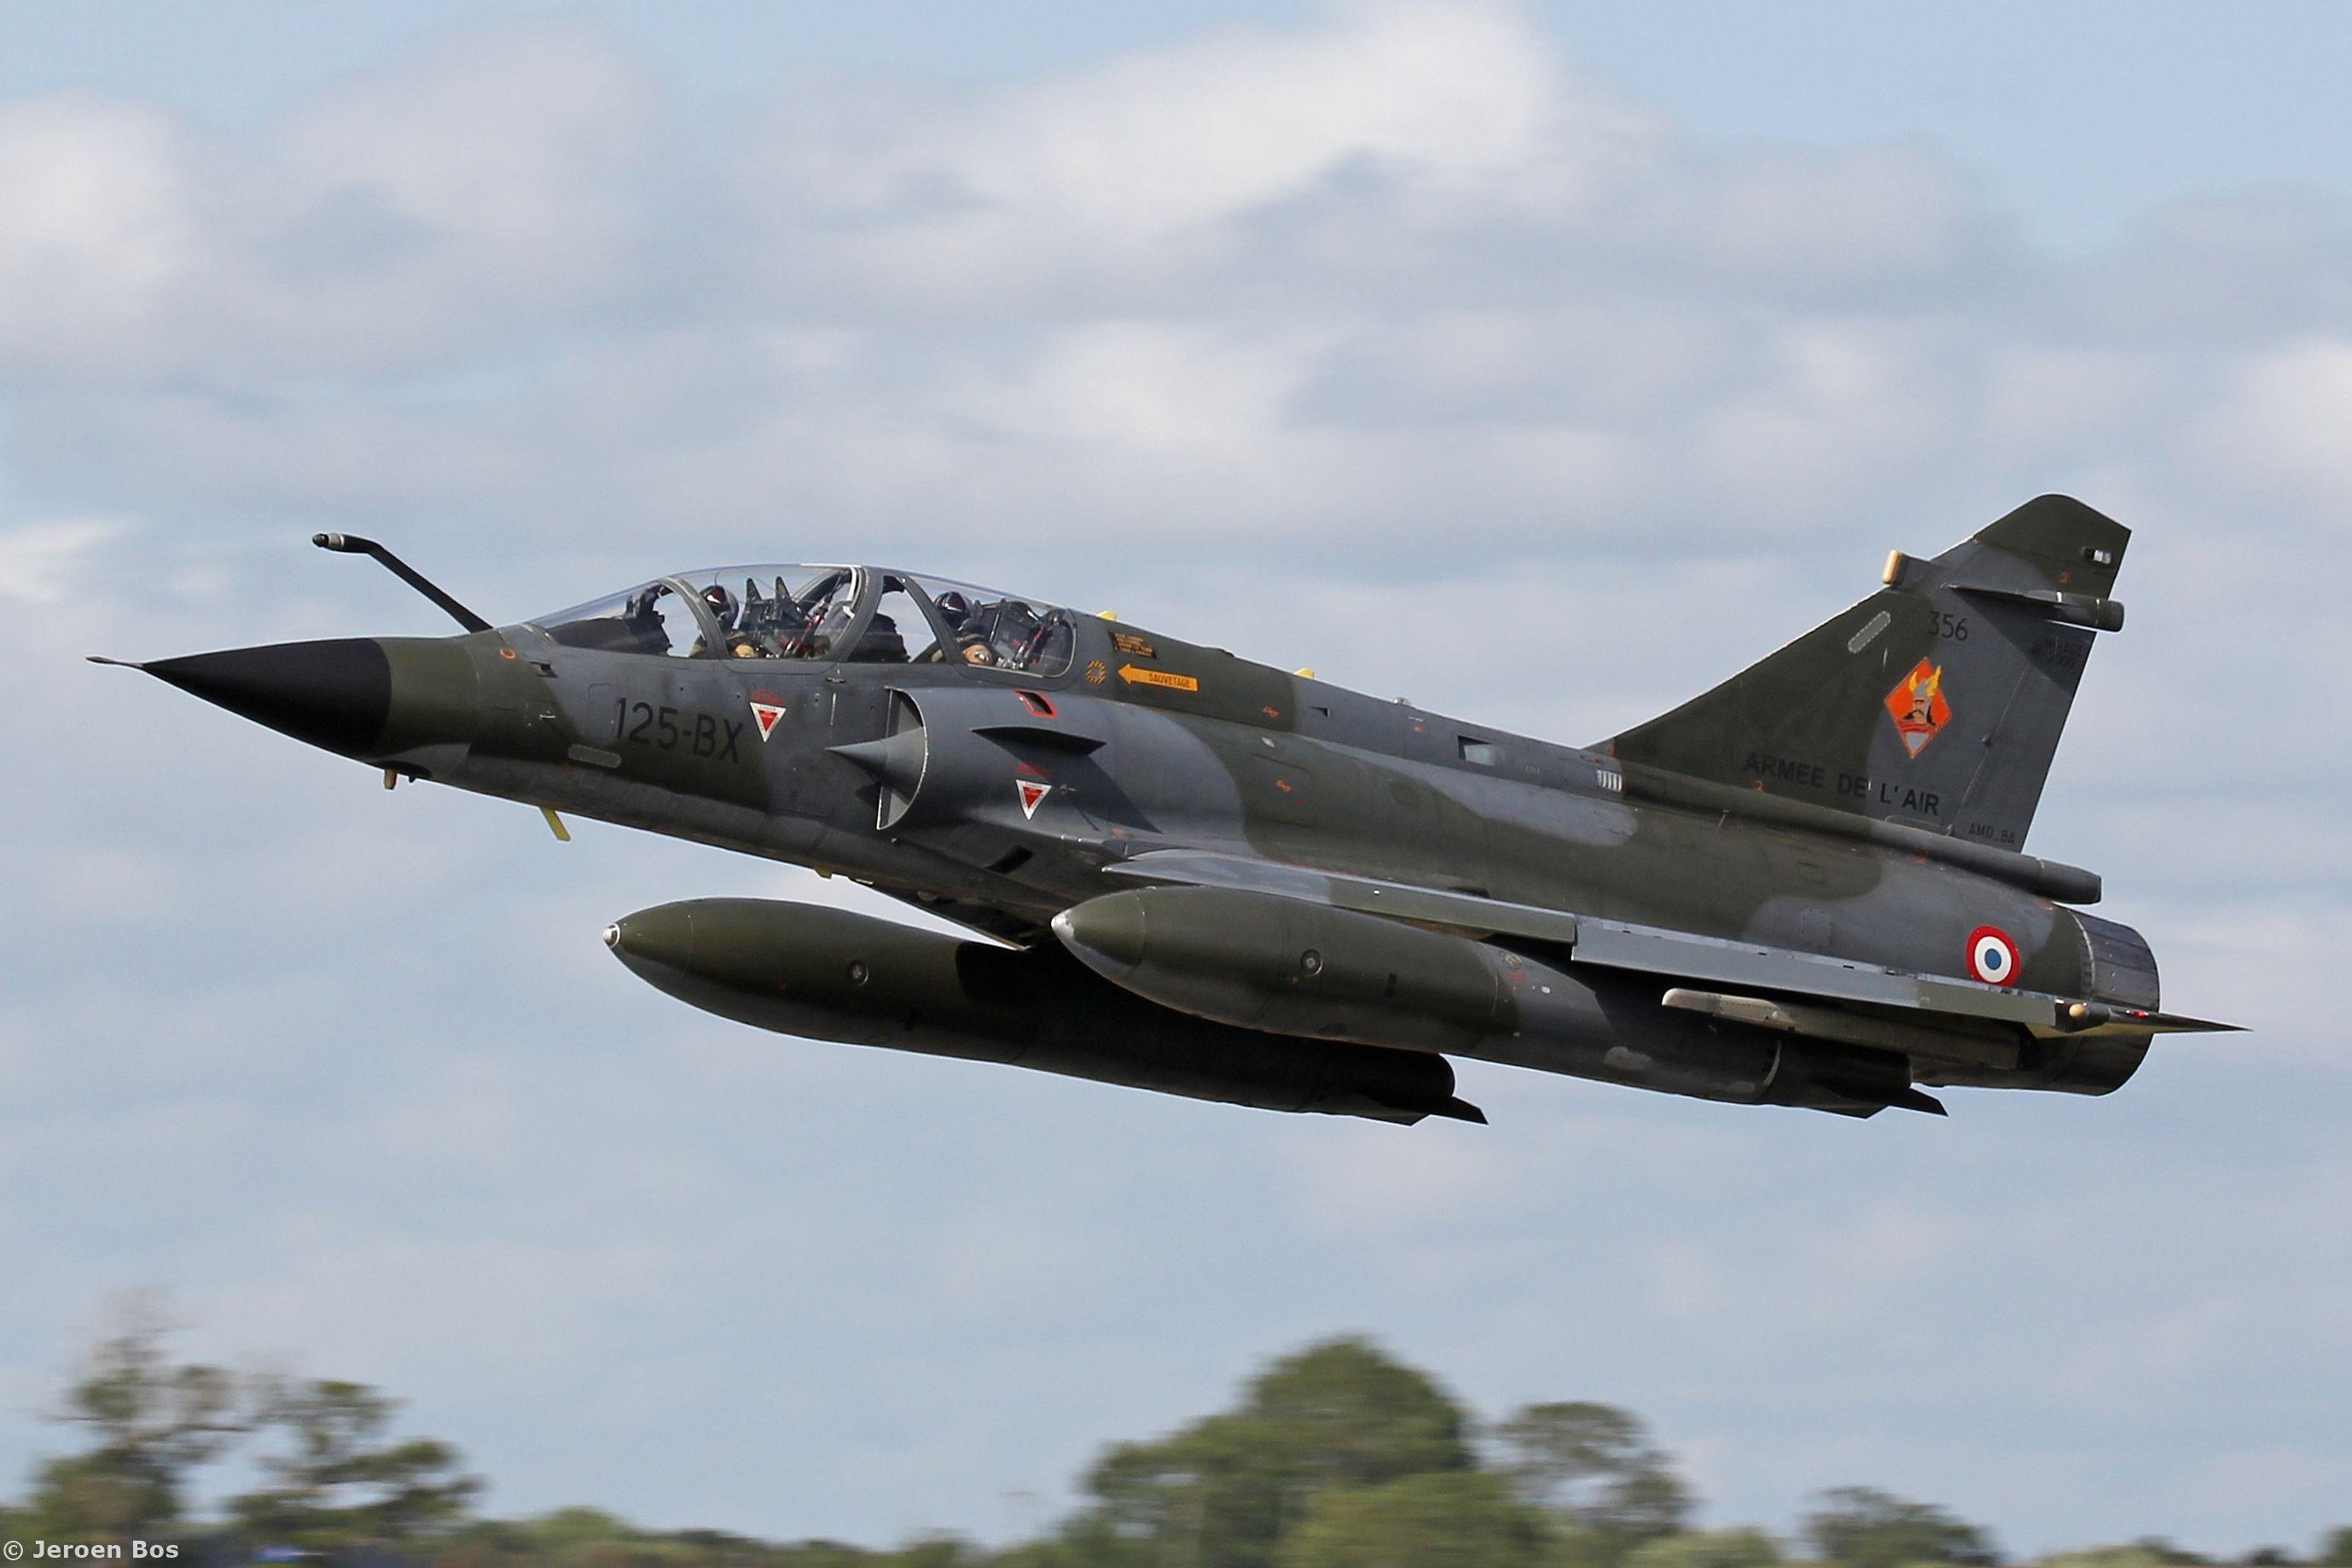 Toutes les tailles | The 'Patrouille RAMEX Delta' Mirage 2000N 356 / 125-BX taking off at RIAT 2015, Fairford UK | Flickr: partage de photos!